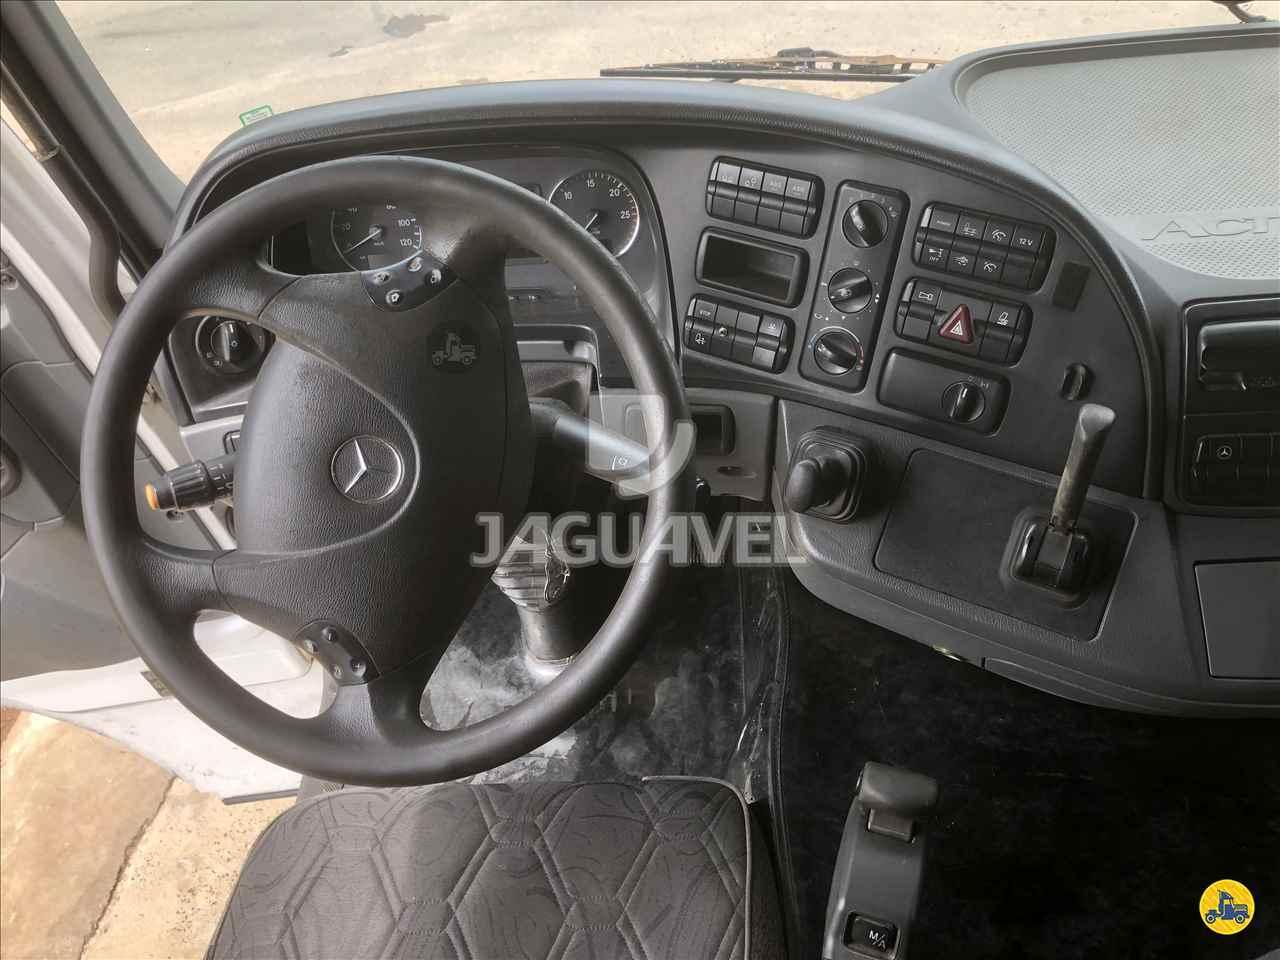 MERCEDES-BENZ MB 2546 600000km 2011/2011 Jaguavel Caminhões